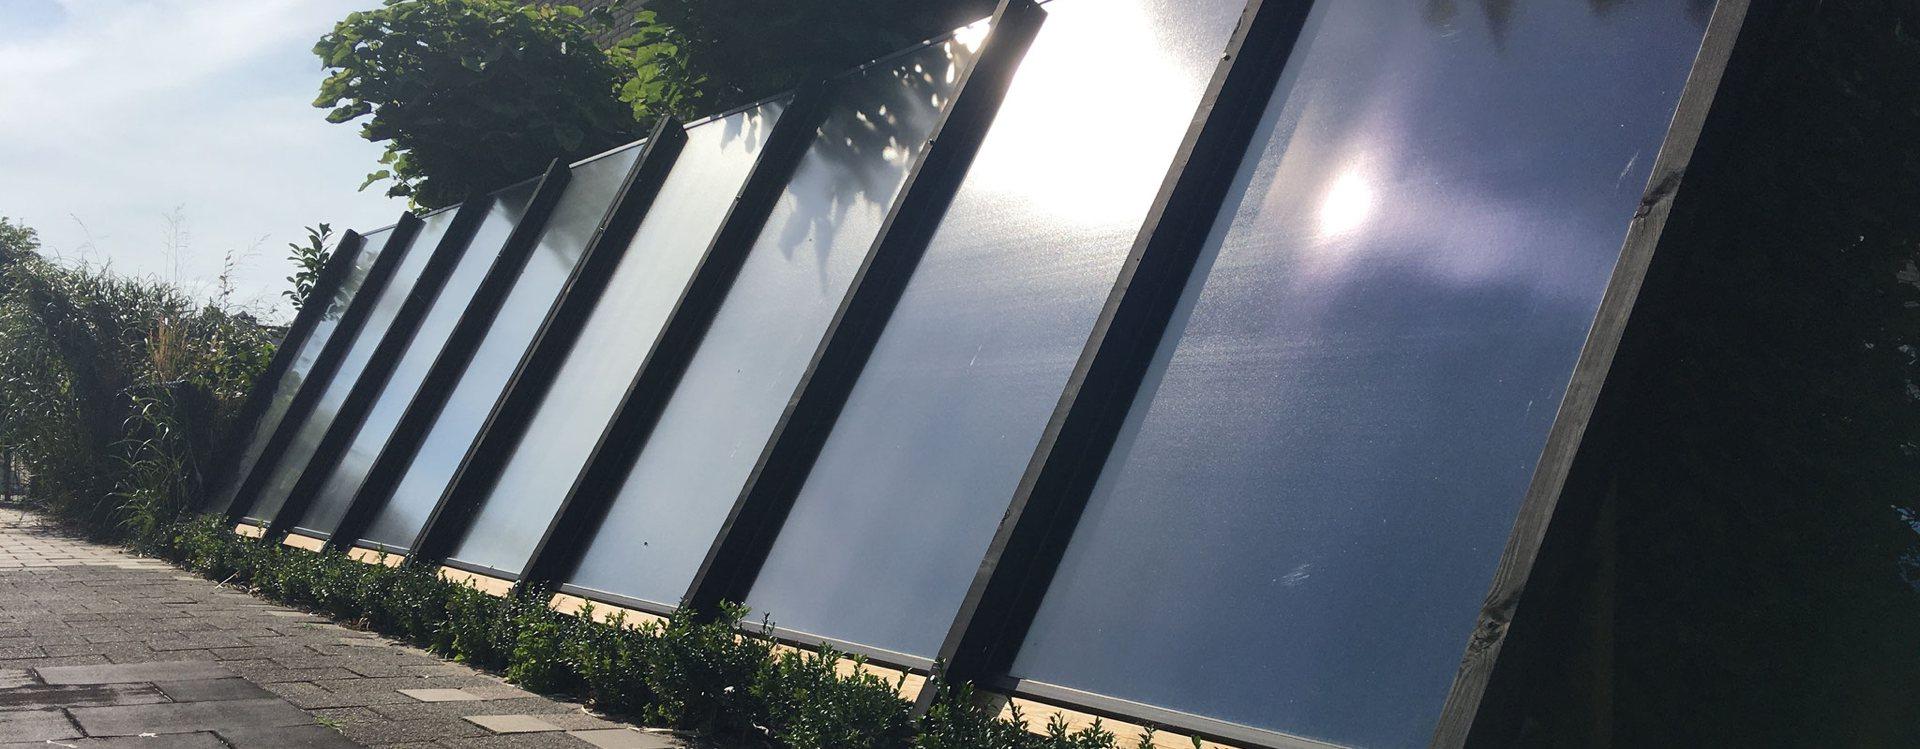 zonneboiler gasvrij